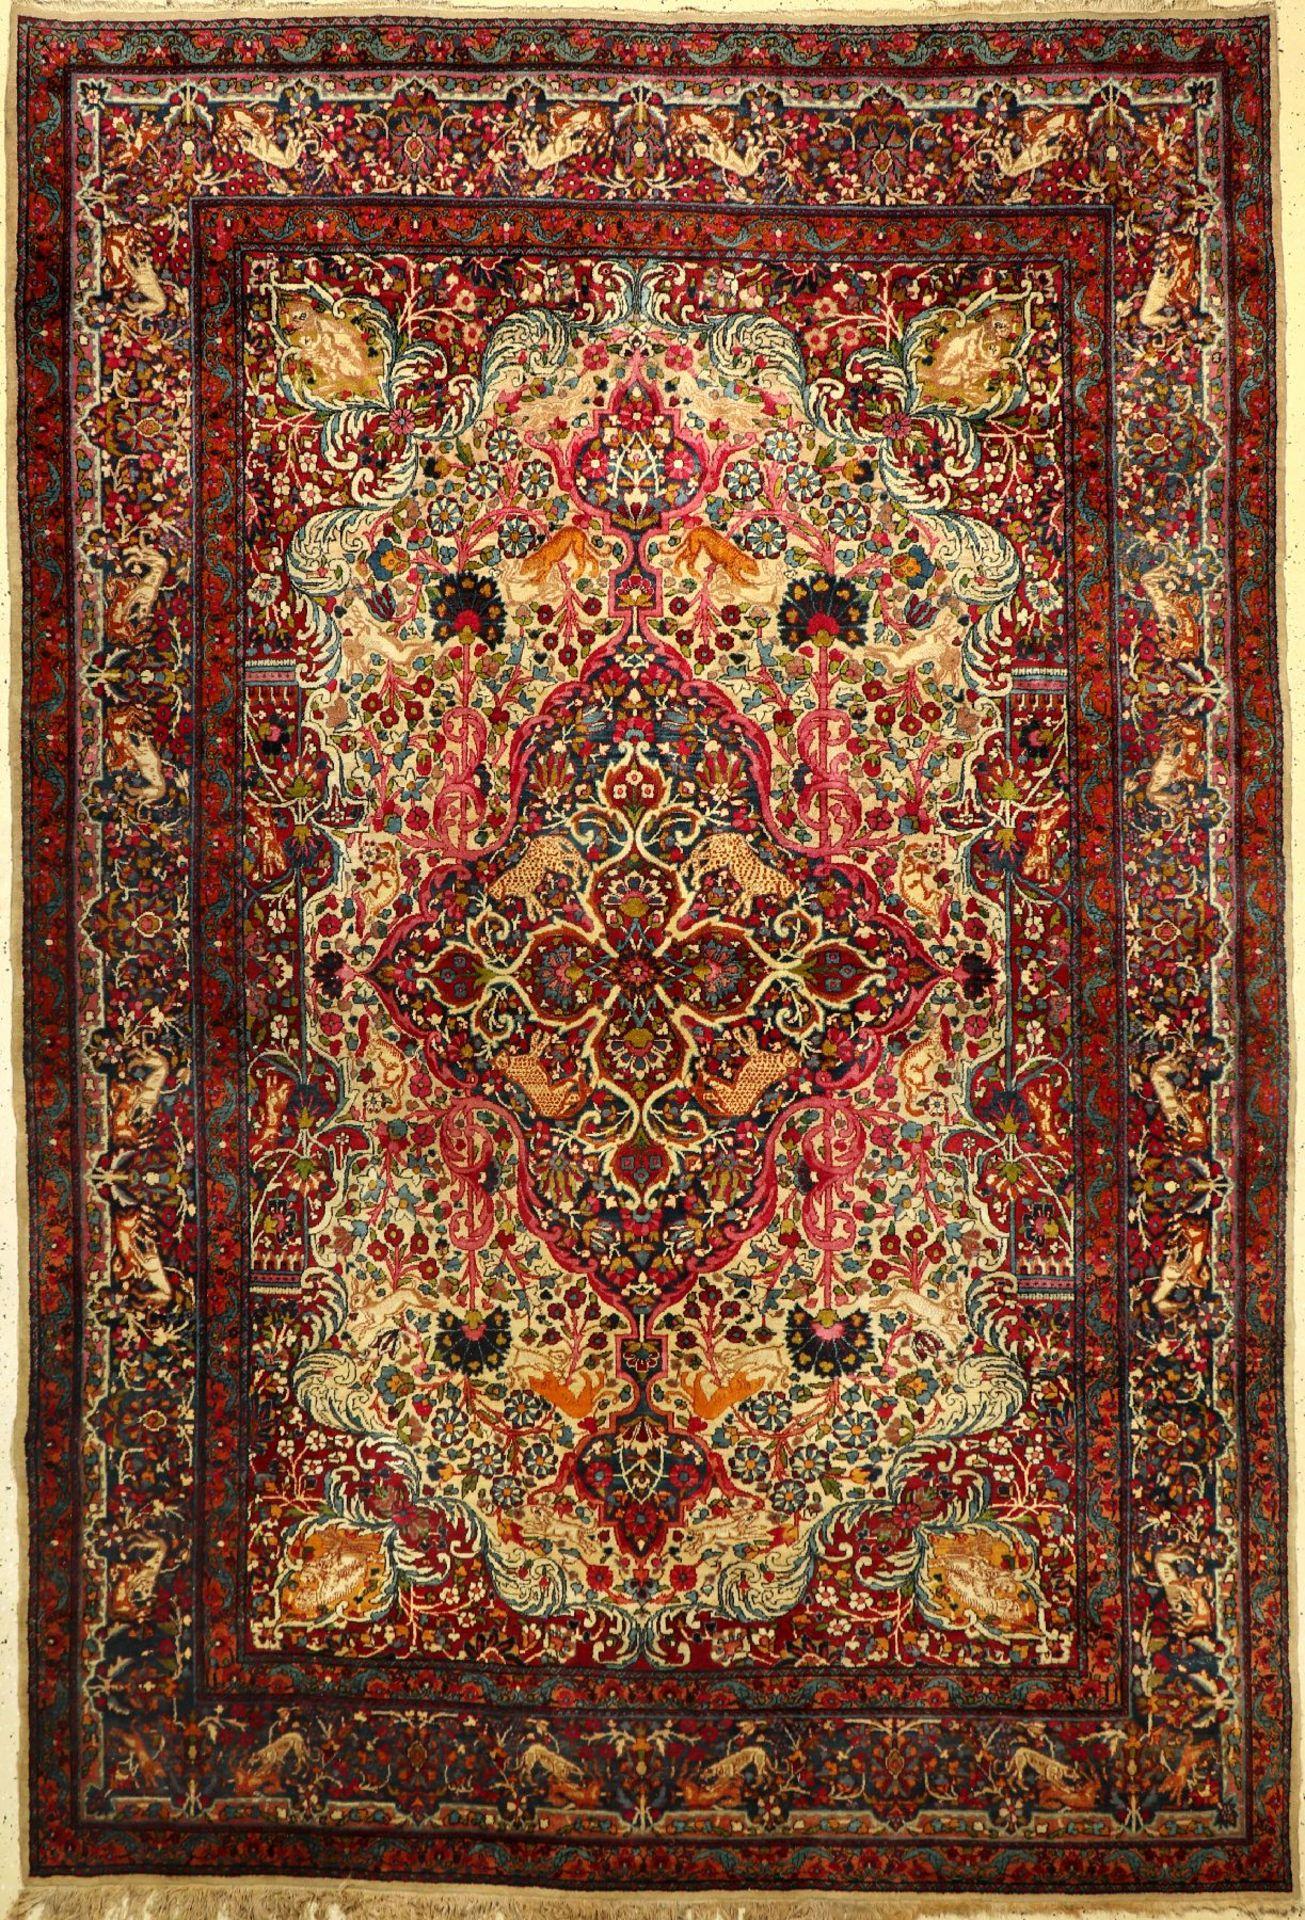 Yazd Carpet antique, Persia, around 1900, woolon cotton, approx. 330 x 222 cm, rare, decorative,